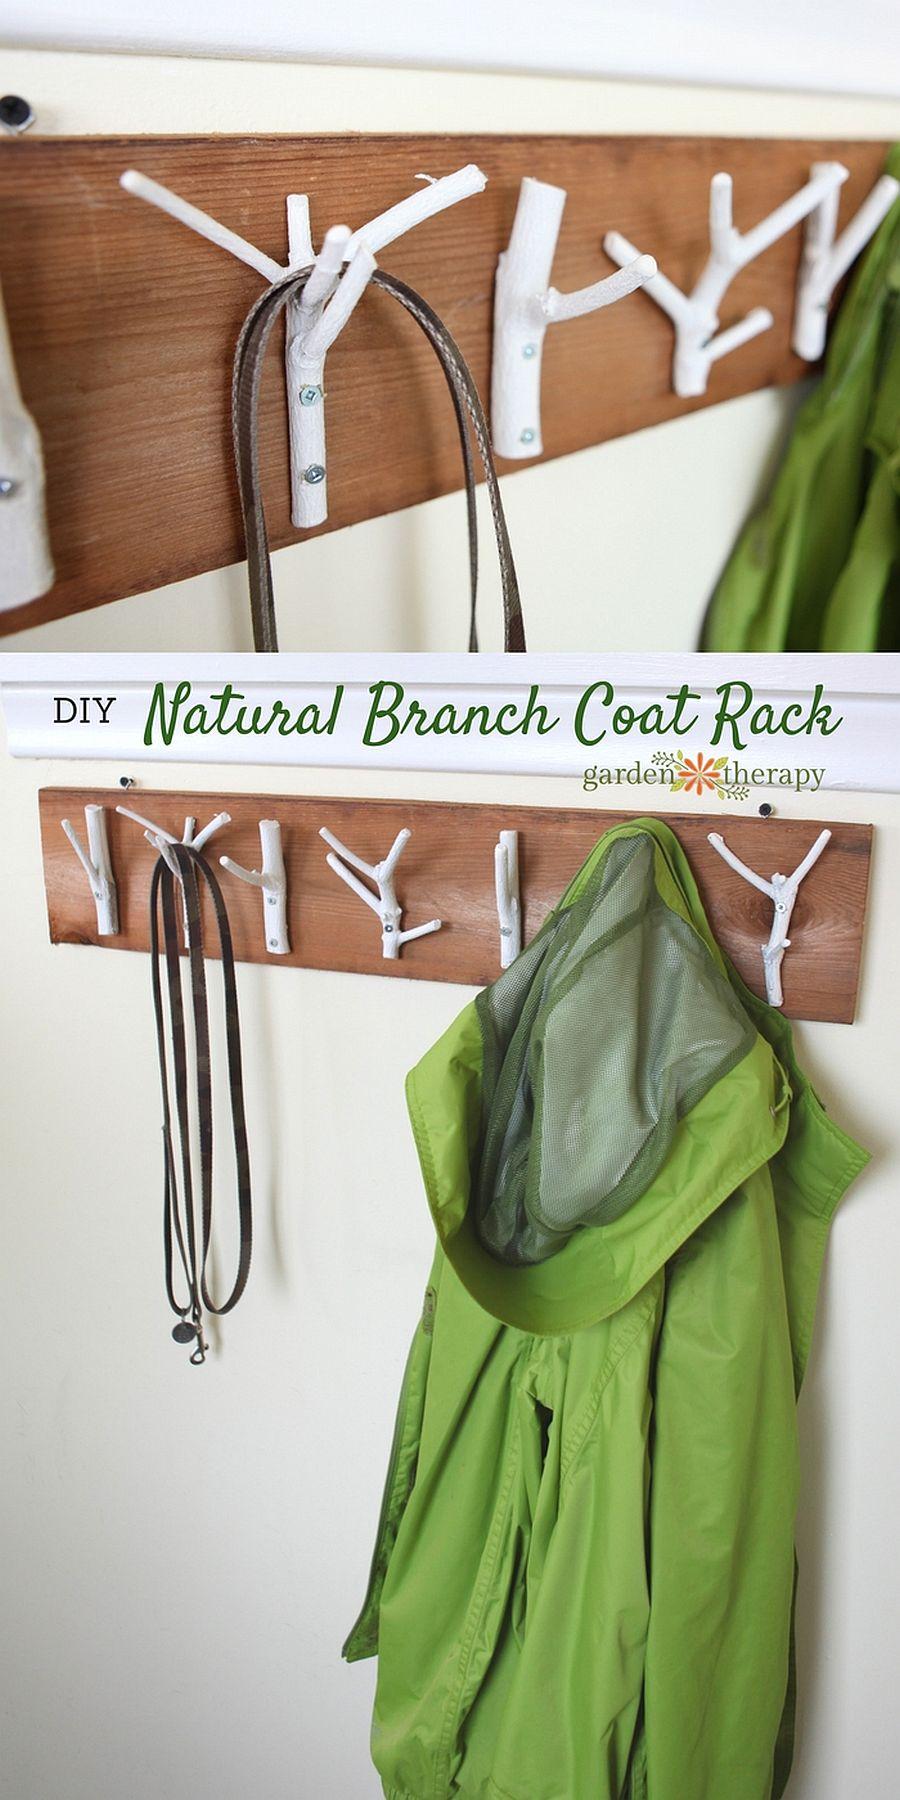 Natural branch coat rack DIY idea